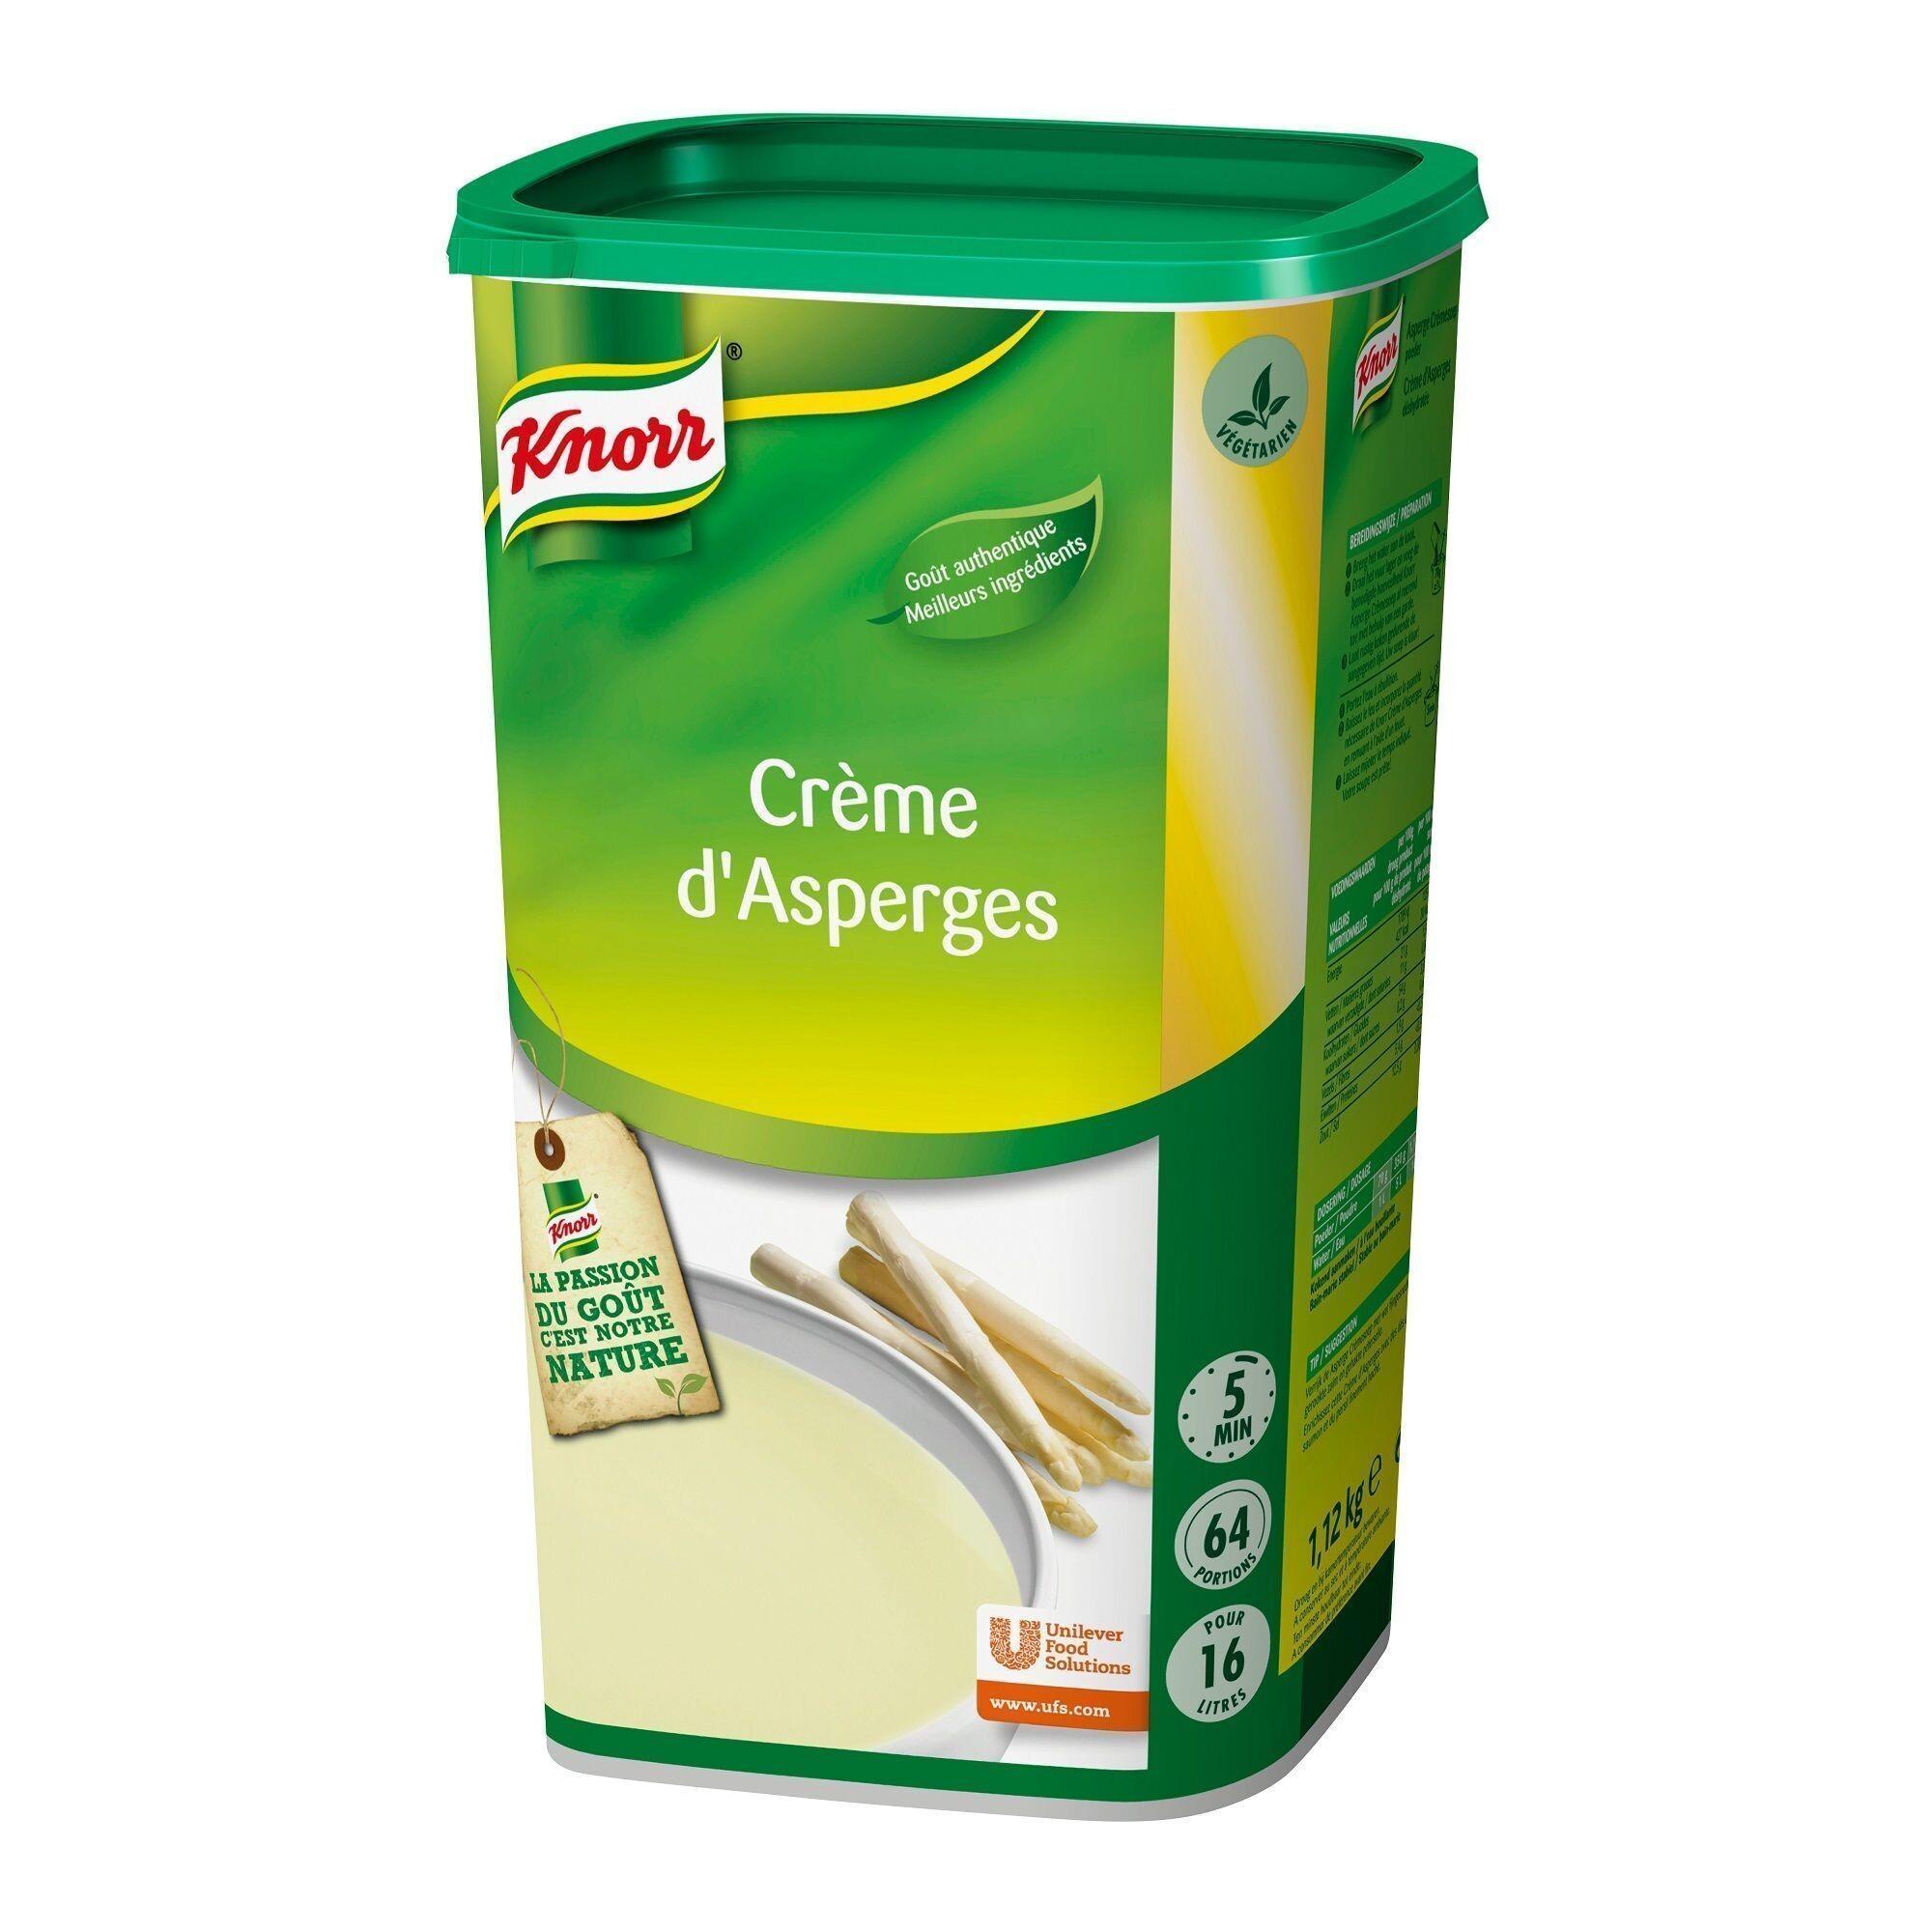 Knorr Soup asparagus 1.37kg Easy Soups